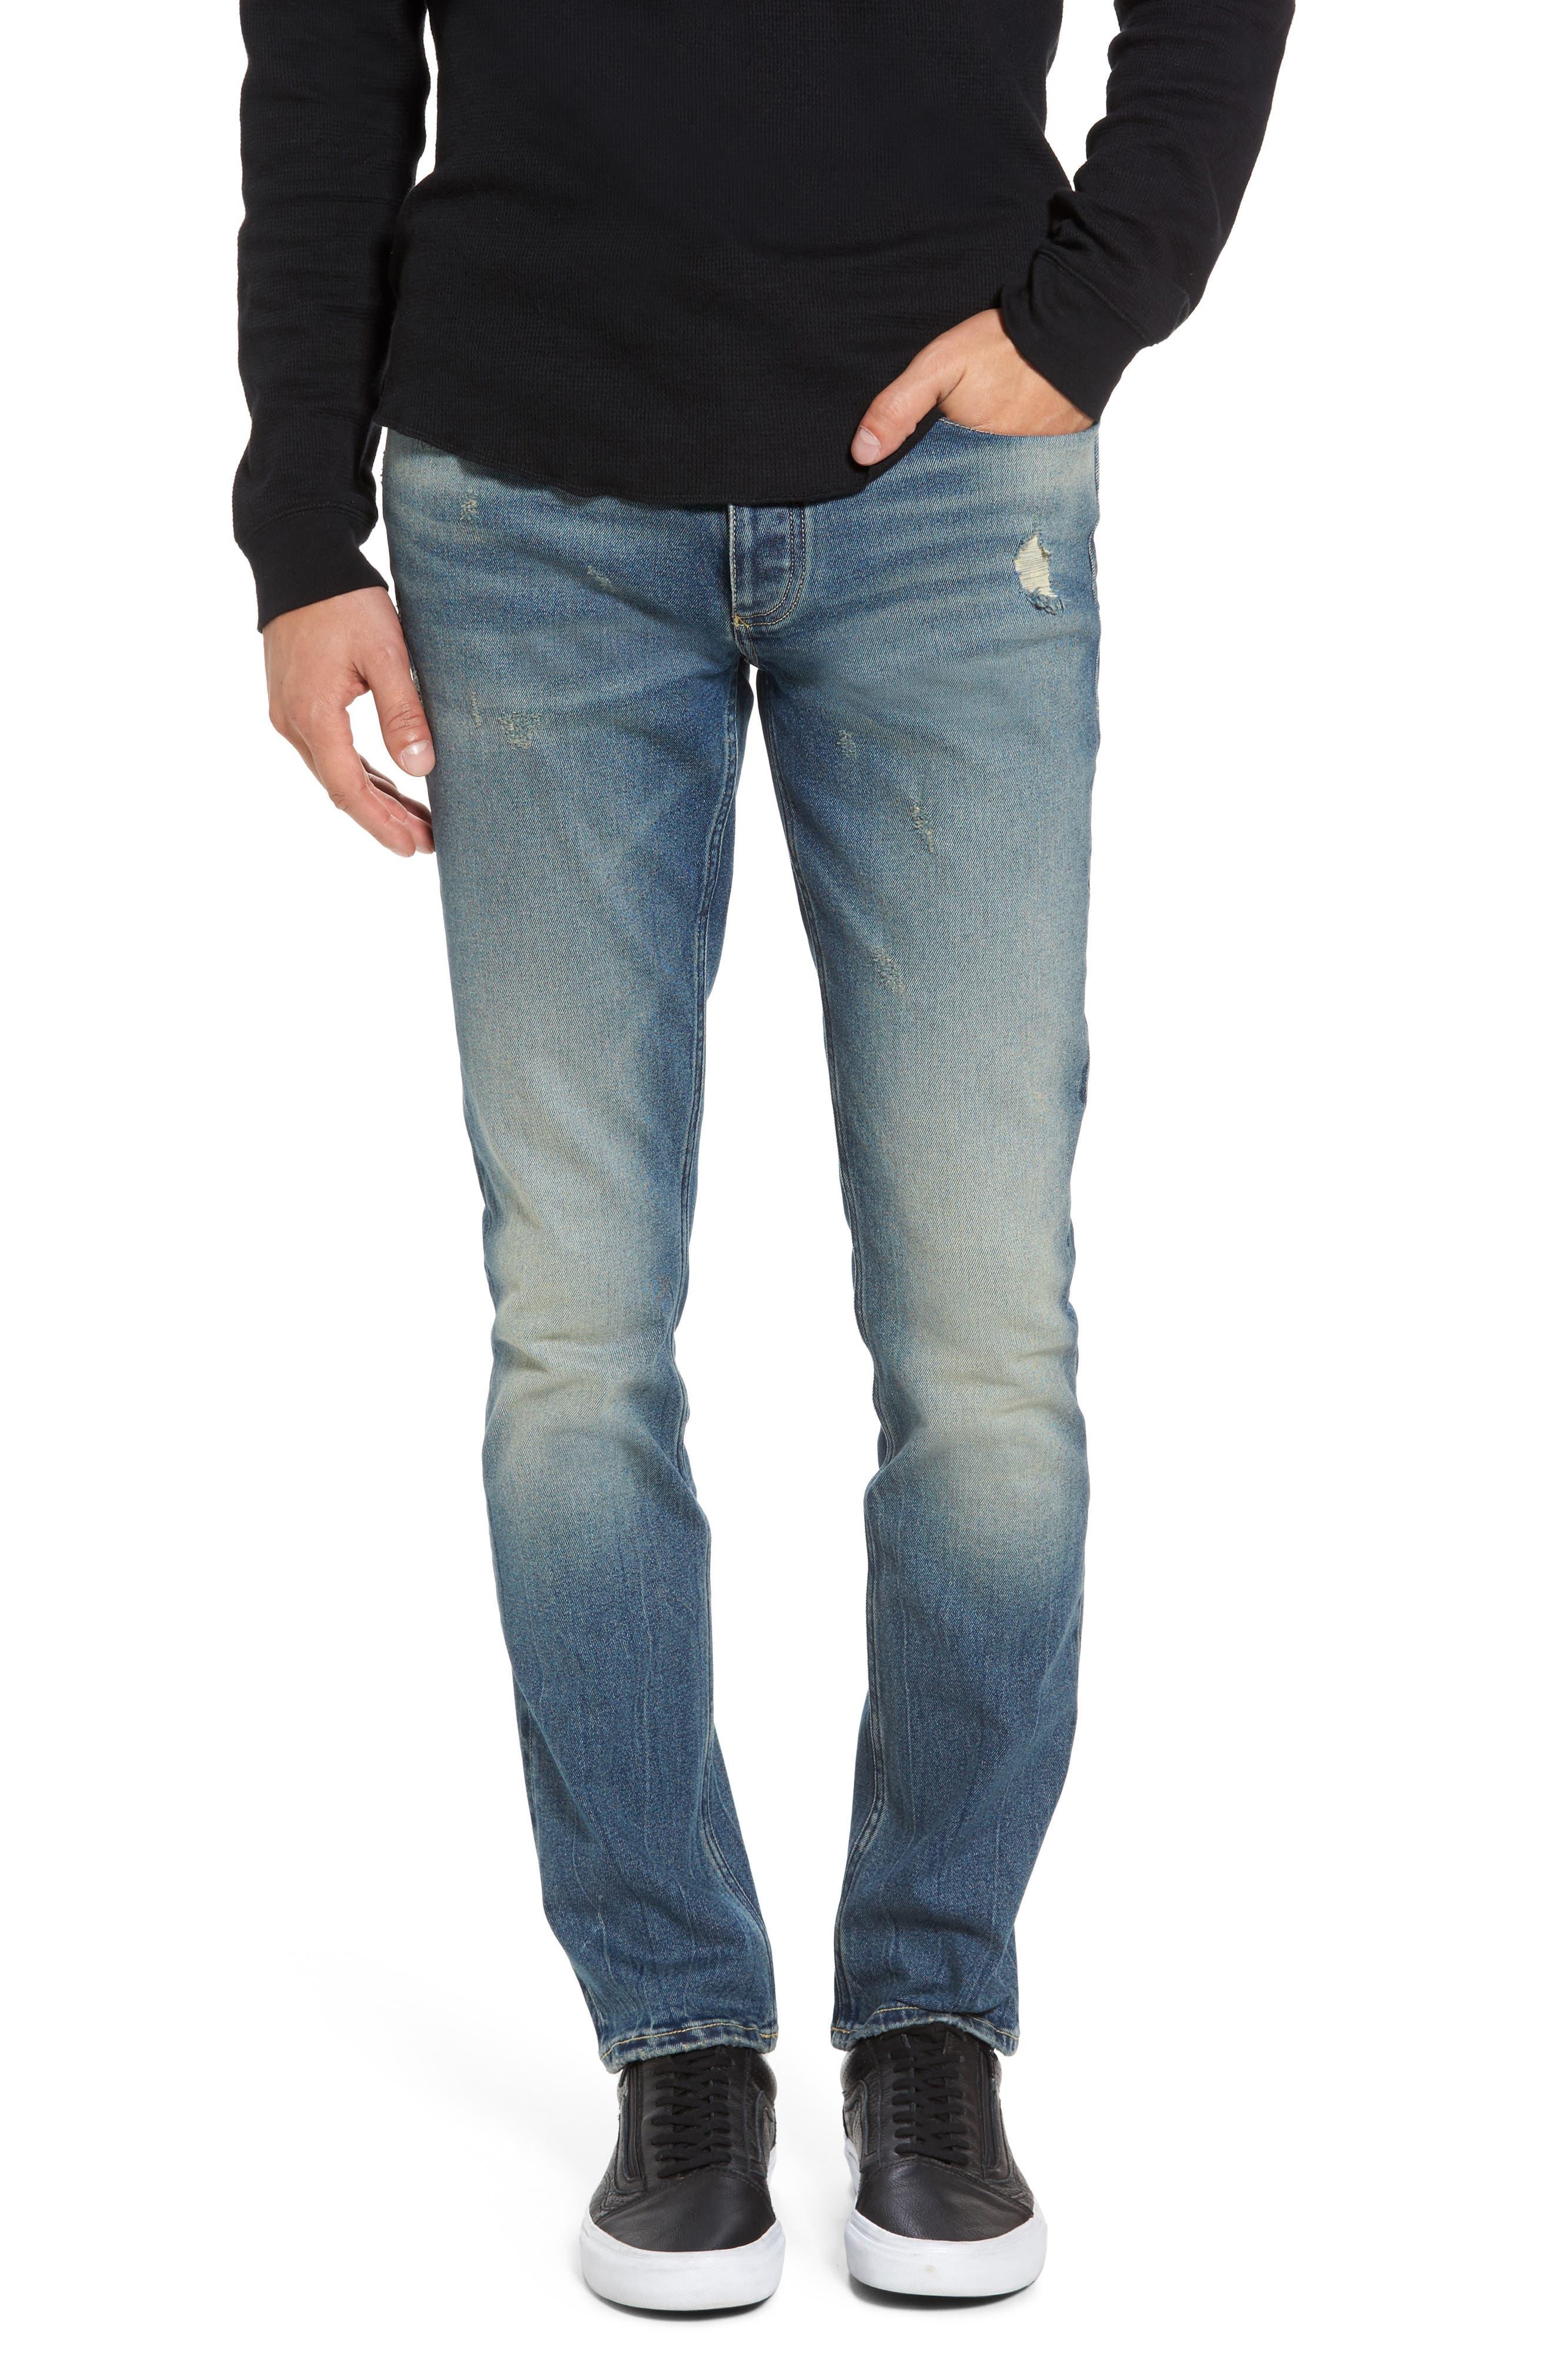 Main Image - Calvin Klein Jeans Skinny Jeans (Tron Blue)